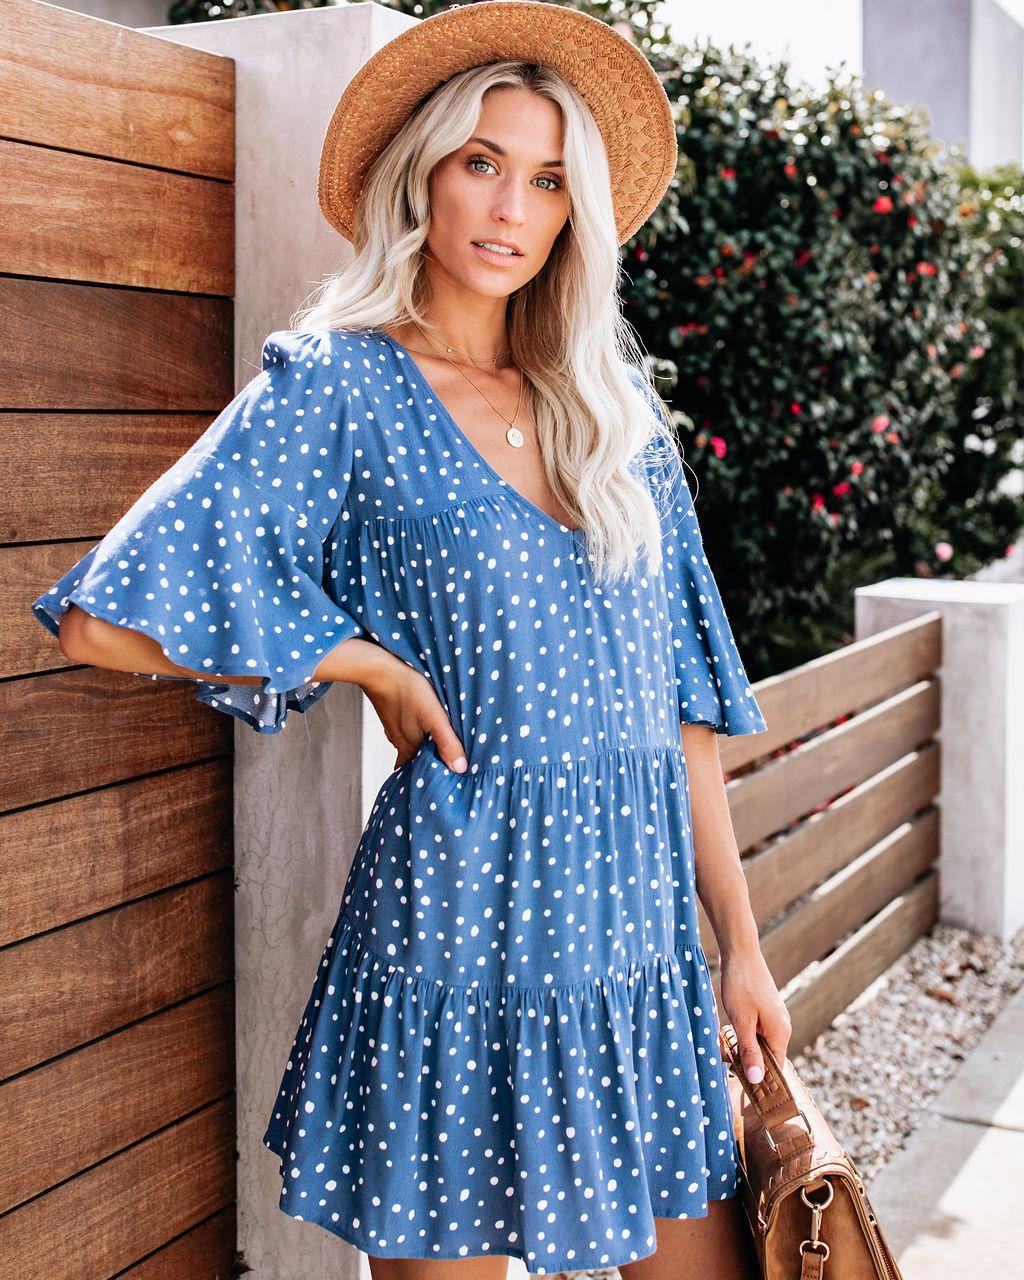 Hailey Polka Dot Babydoll Dress Blue Vici Spring Outfits Boho Boho Chic Fashion Spring Outfits [ 1280 x 1024 Pixel ]